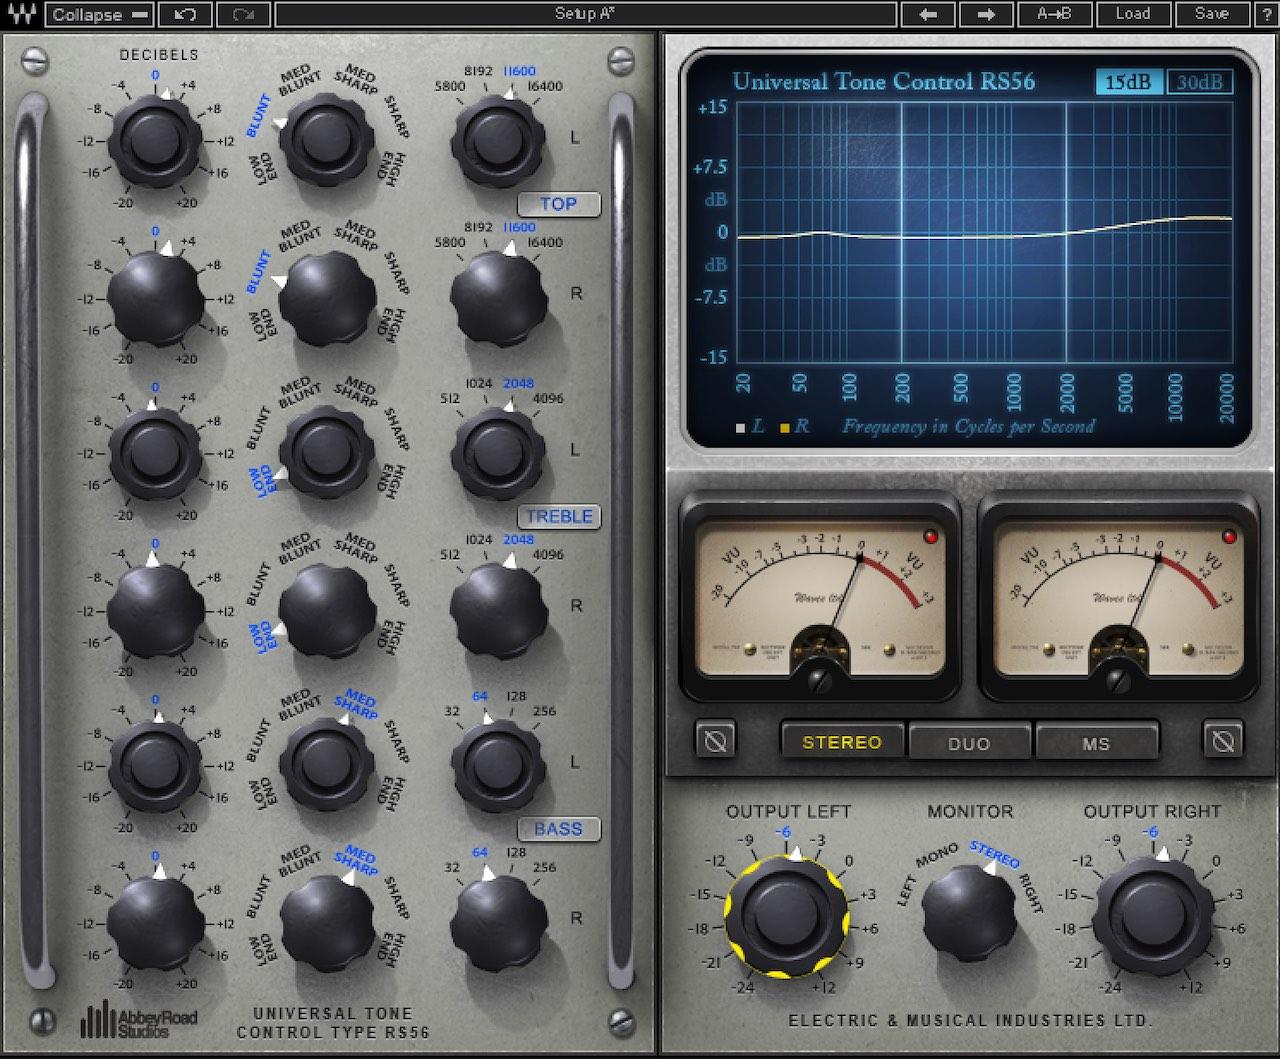 Waves RS56 Passive EQ - Waves audio